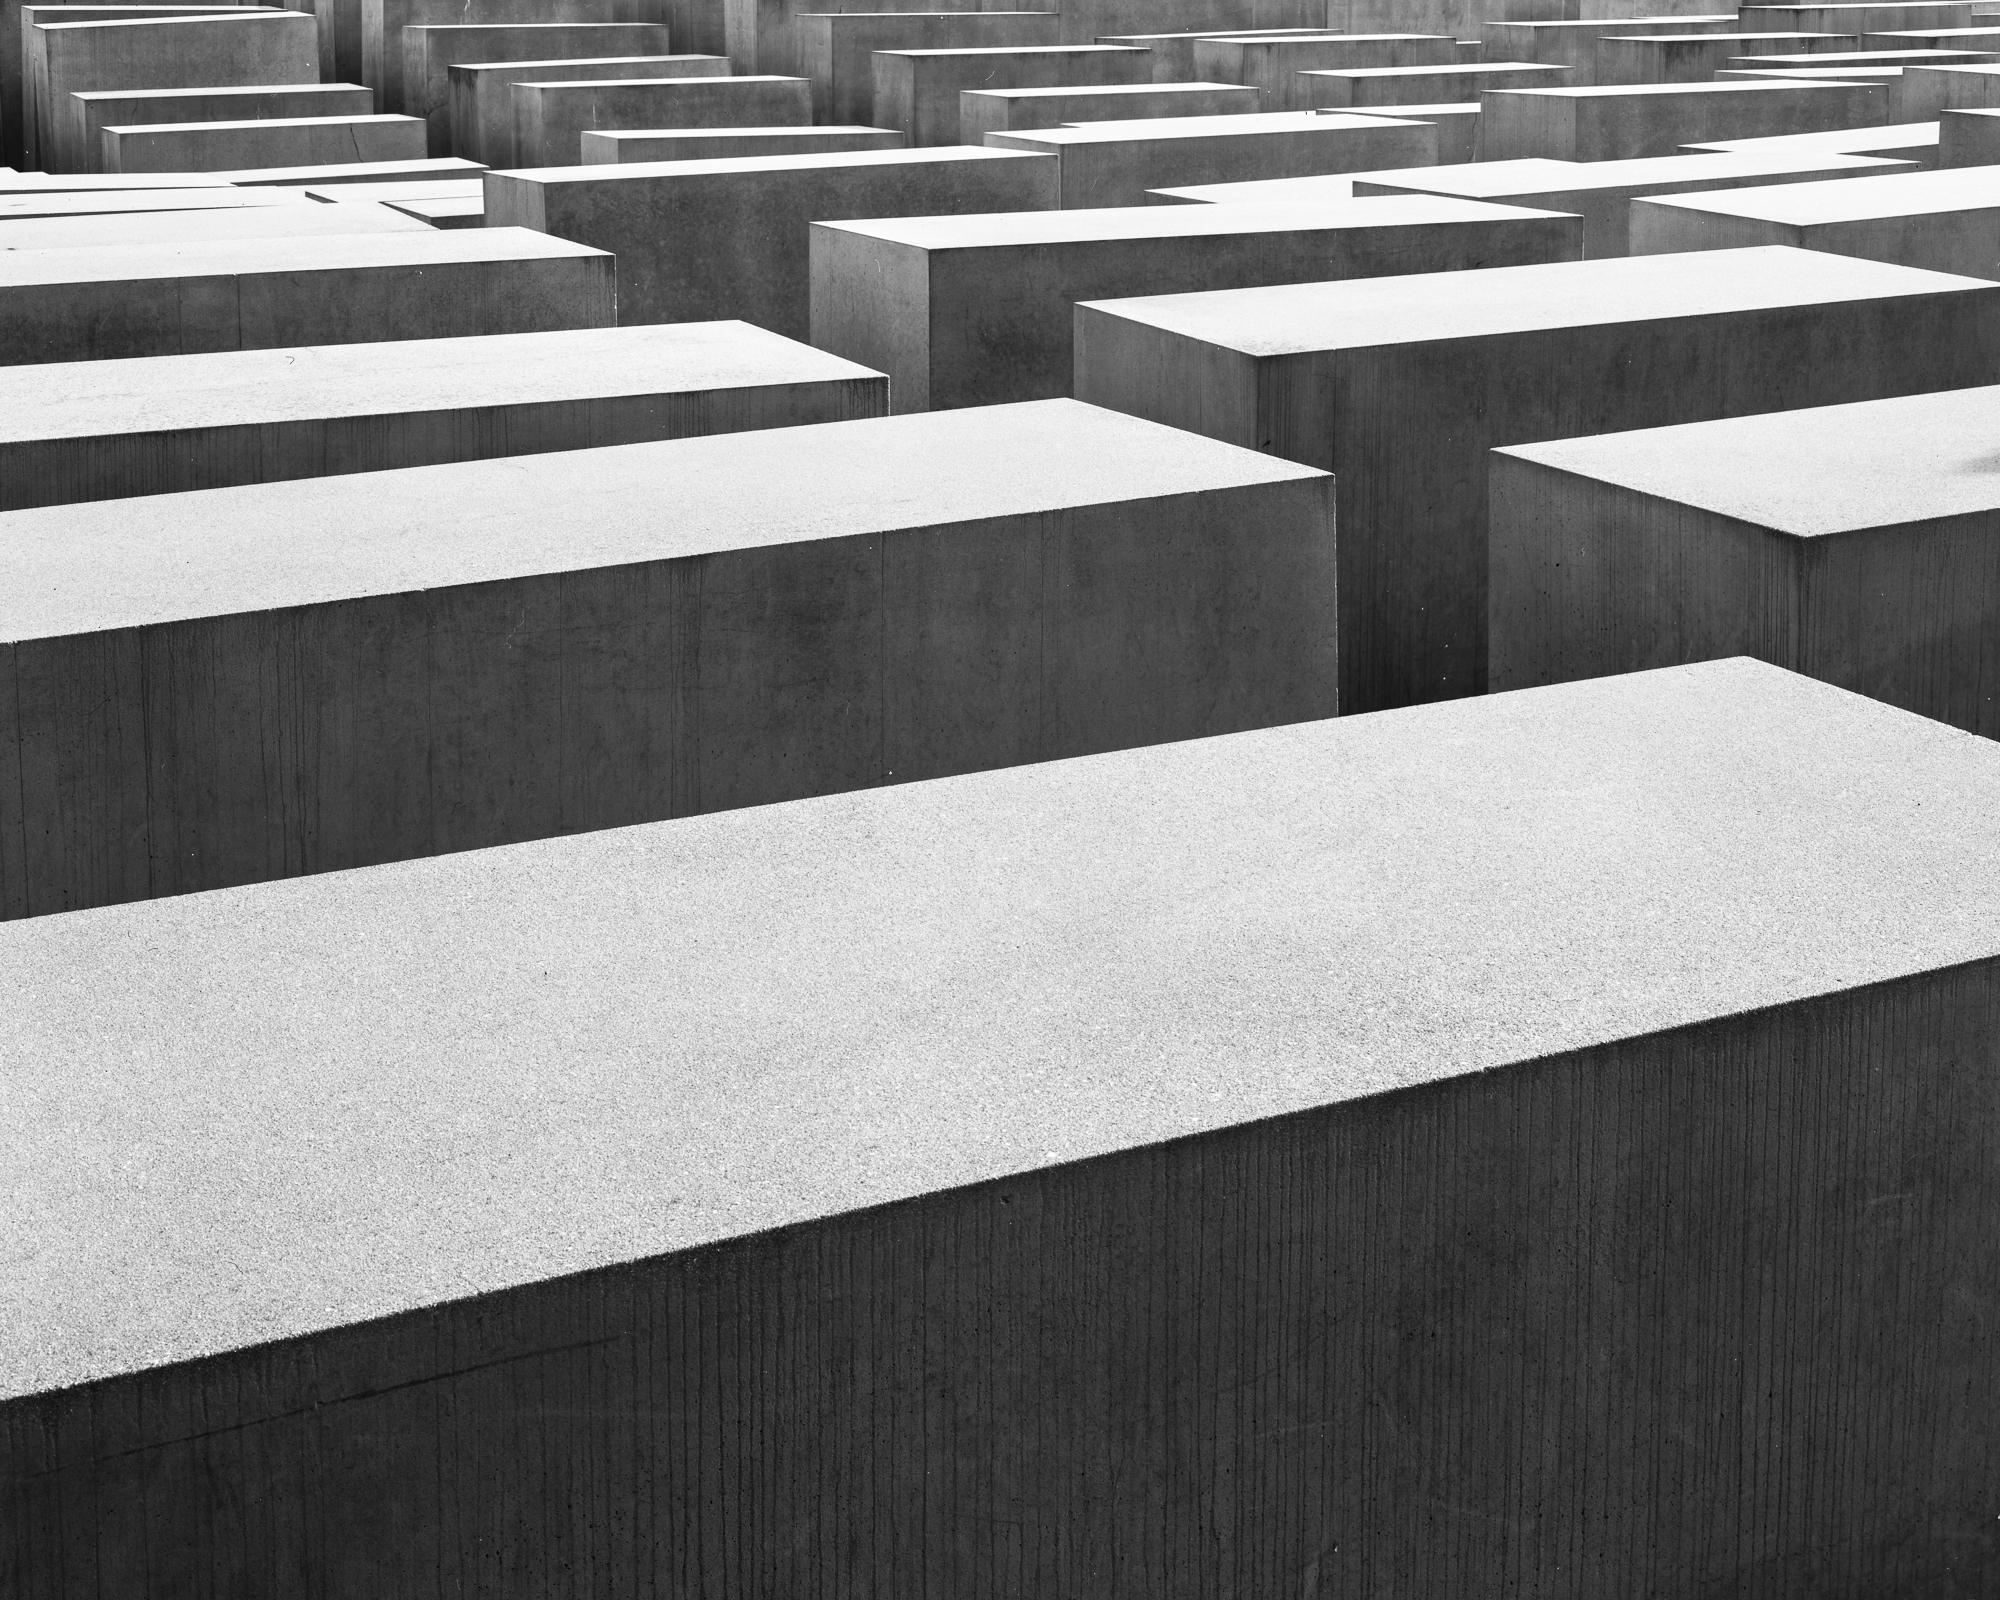 Holocaust Memorial, Berlin-004.jpg